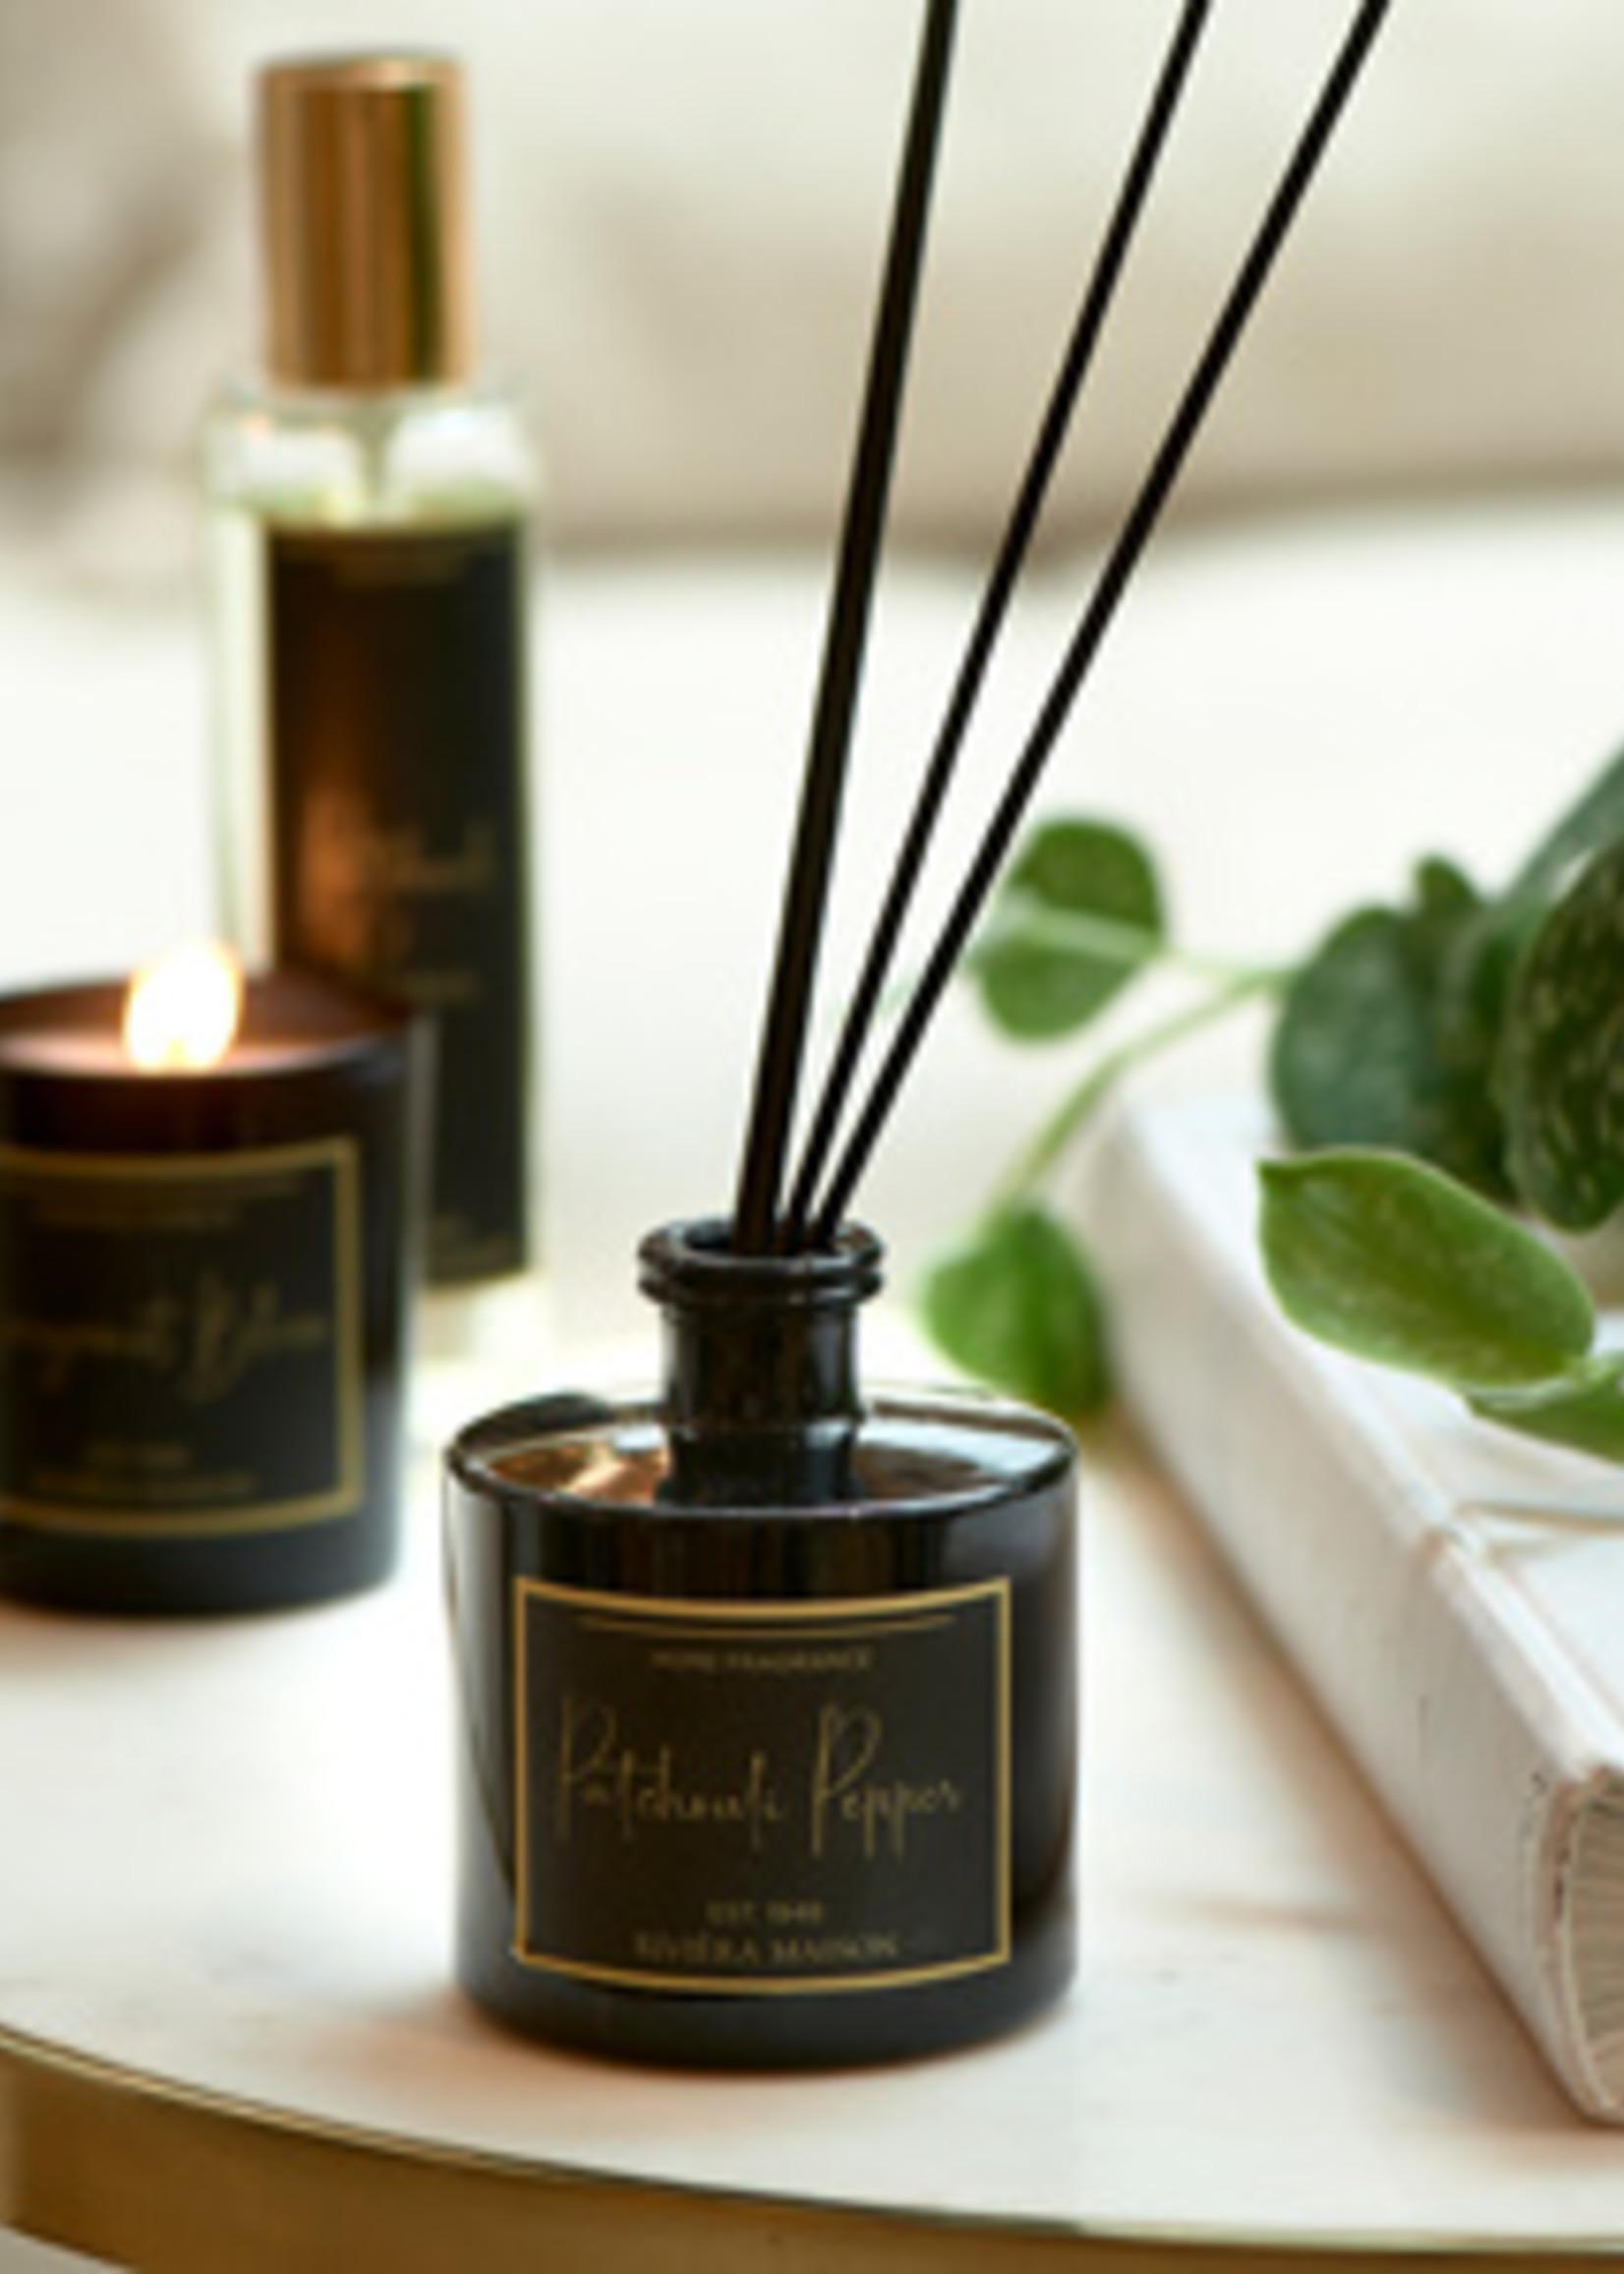 Riviera Maison Patchouli Pepper Fragrance Sticks